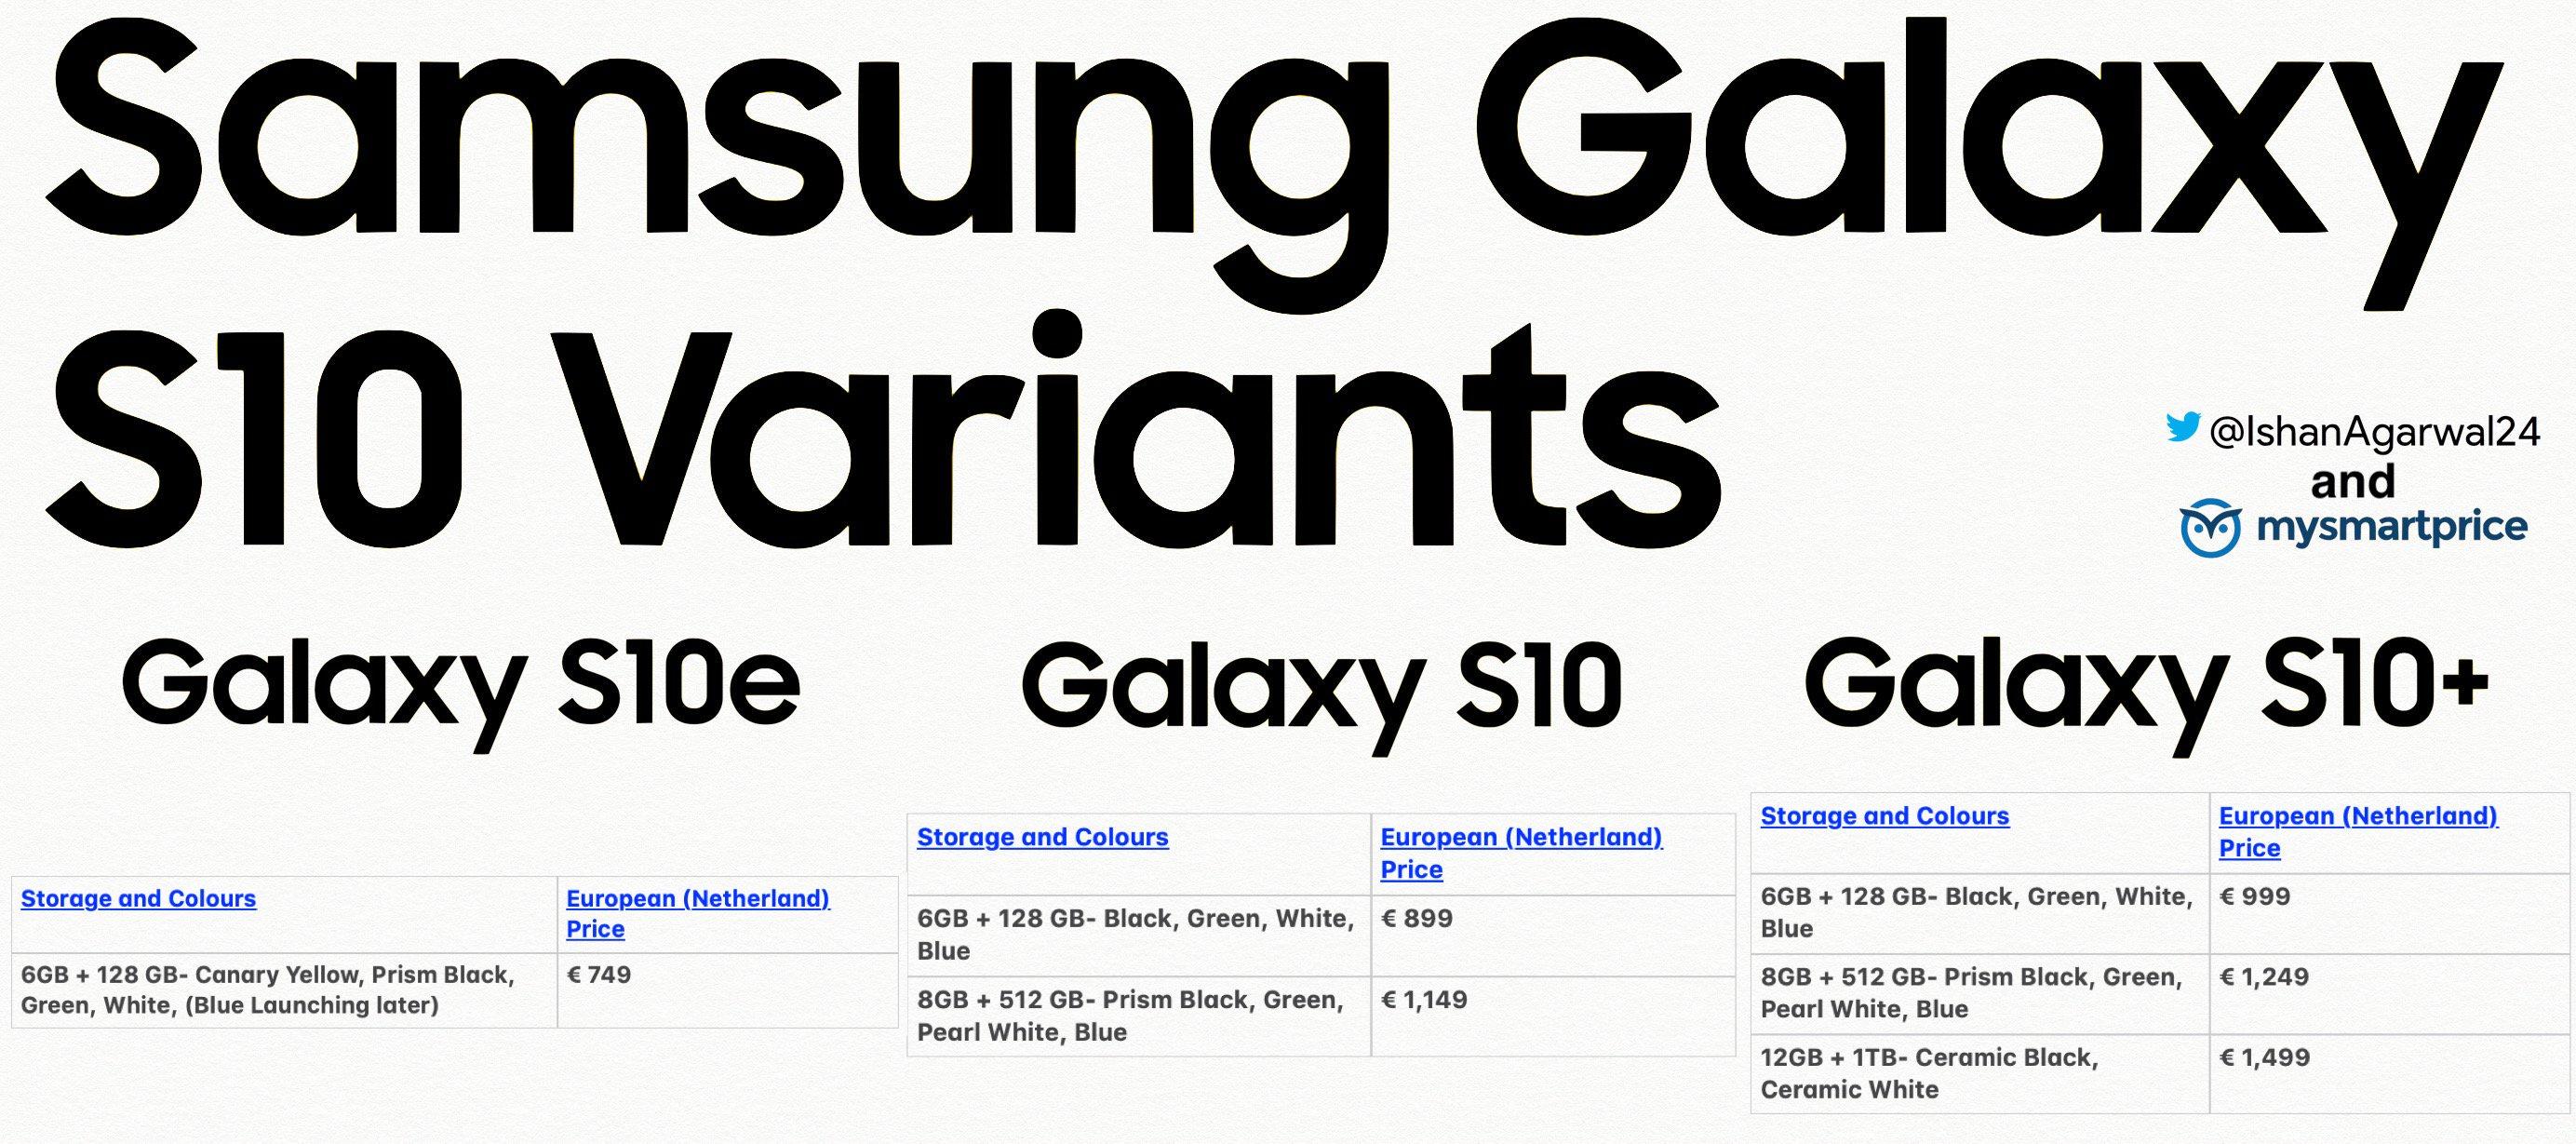 XKrV5fBscesoqoXHrUki9J - Samsung Galaxy S10 Plus release date, price, news and leaks